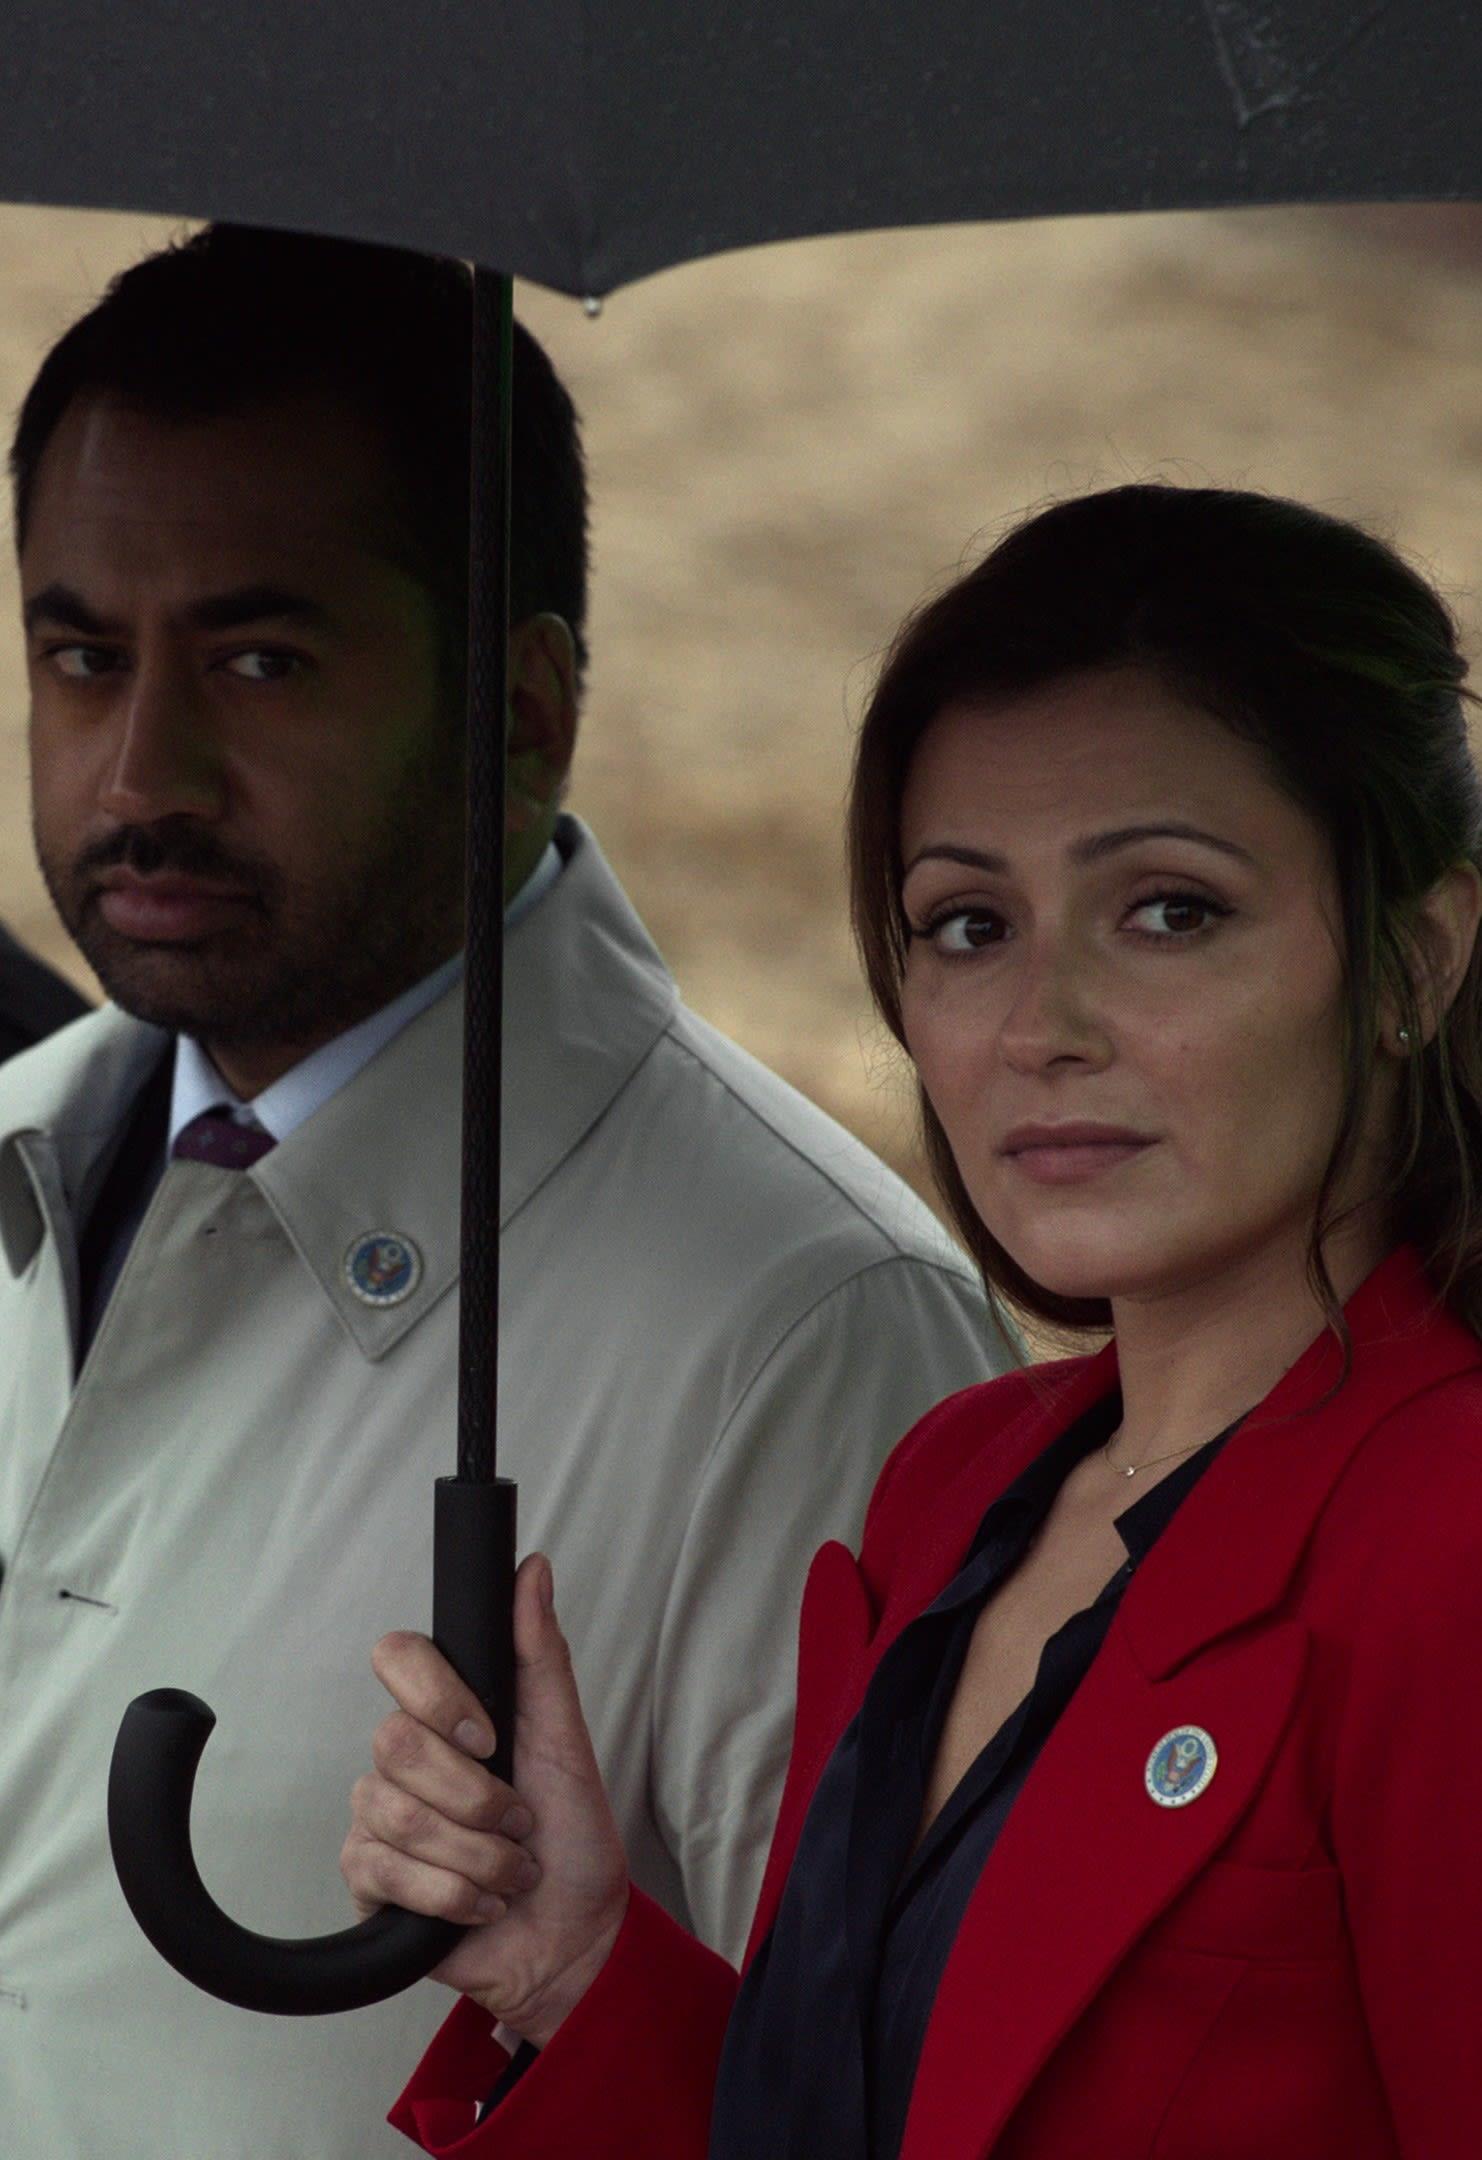 Personal Troubles Tall Designated Survivor Season 3 Episode 2 Tv Fanatic,Best Film Production Design